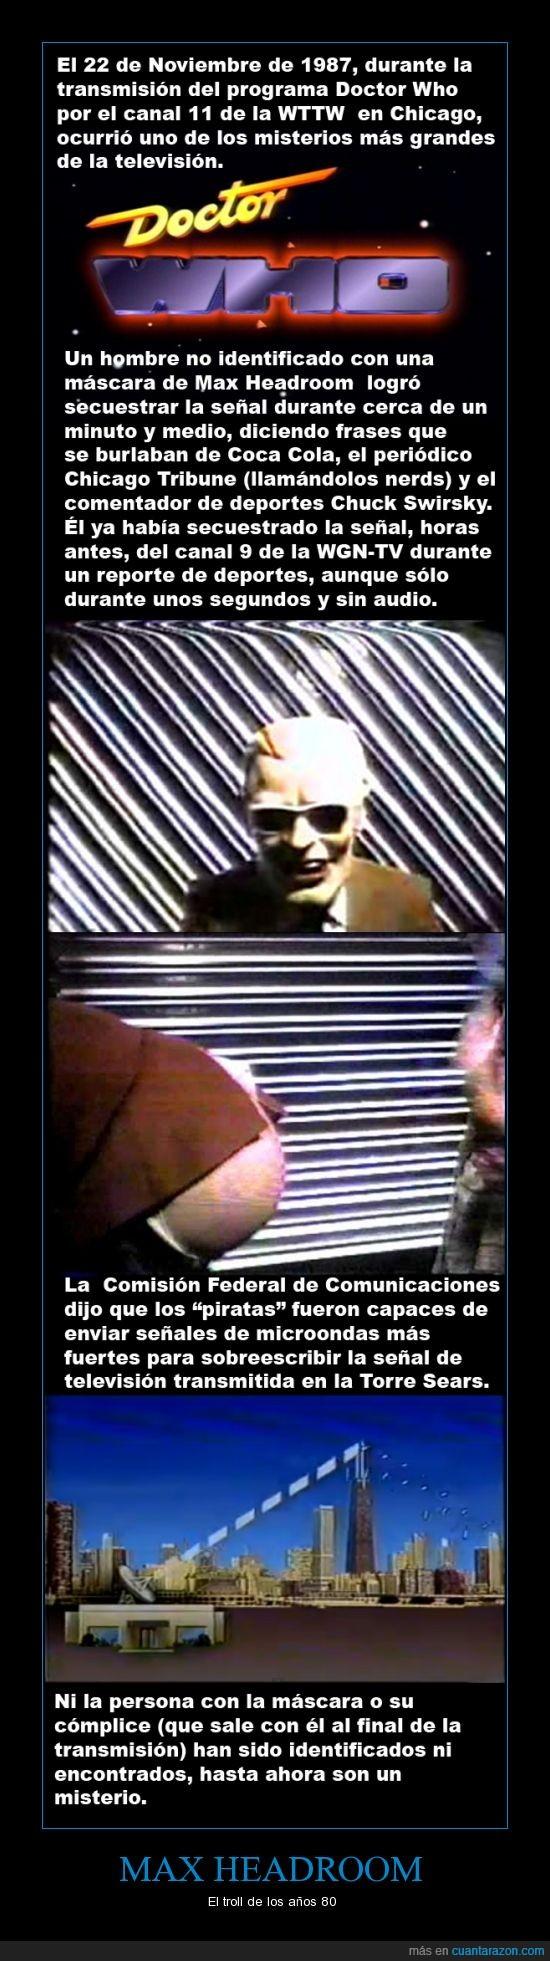 1987,chicago,incidente,max headroom,trollear